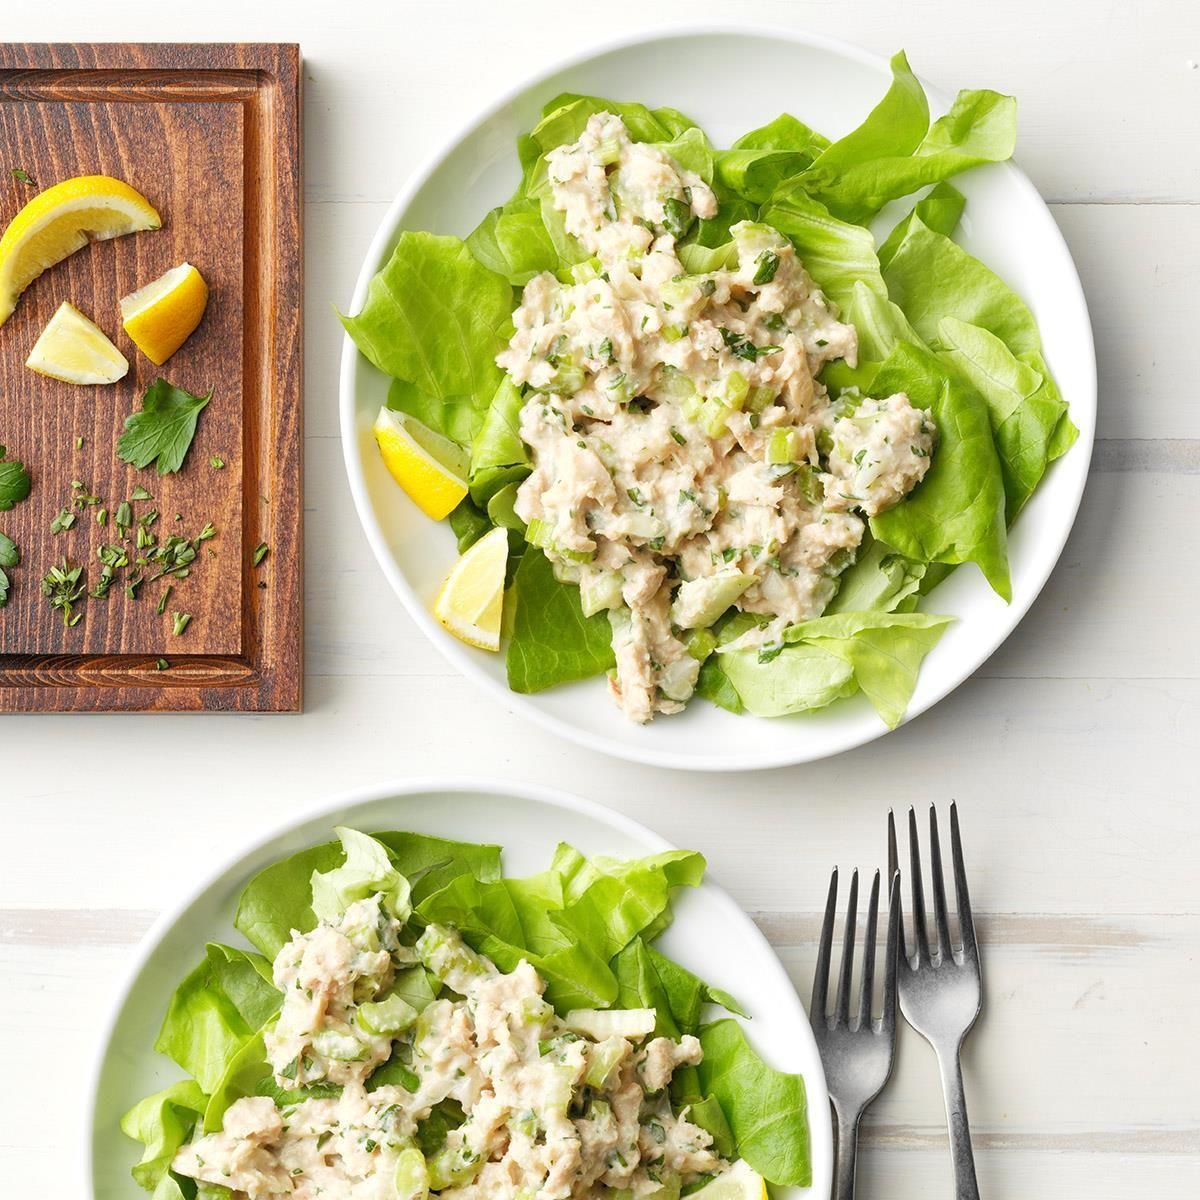 15 Easy Healthy Tuna Recipes Healthy Tuna Recipes Healthy Tuna Canned Tuna Recipes